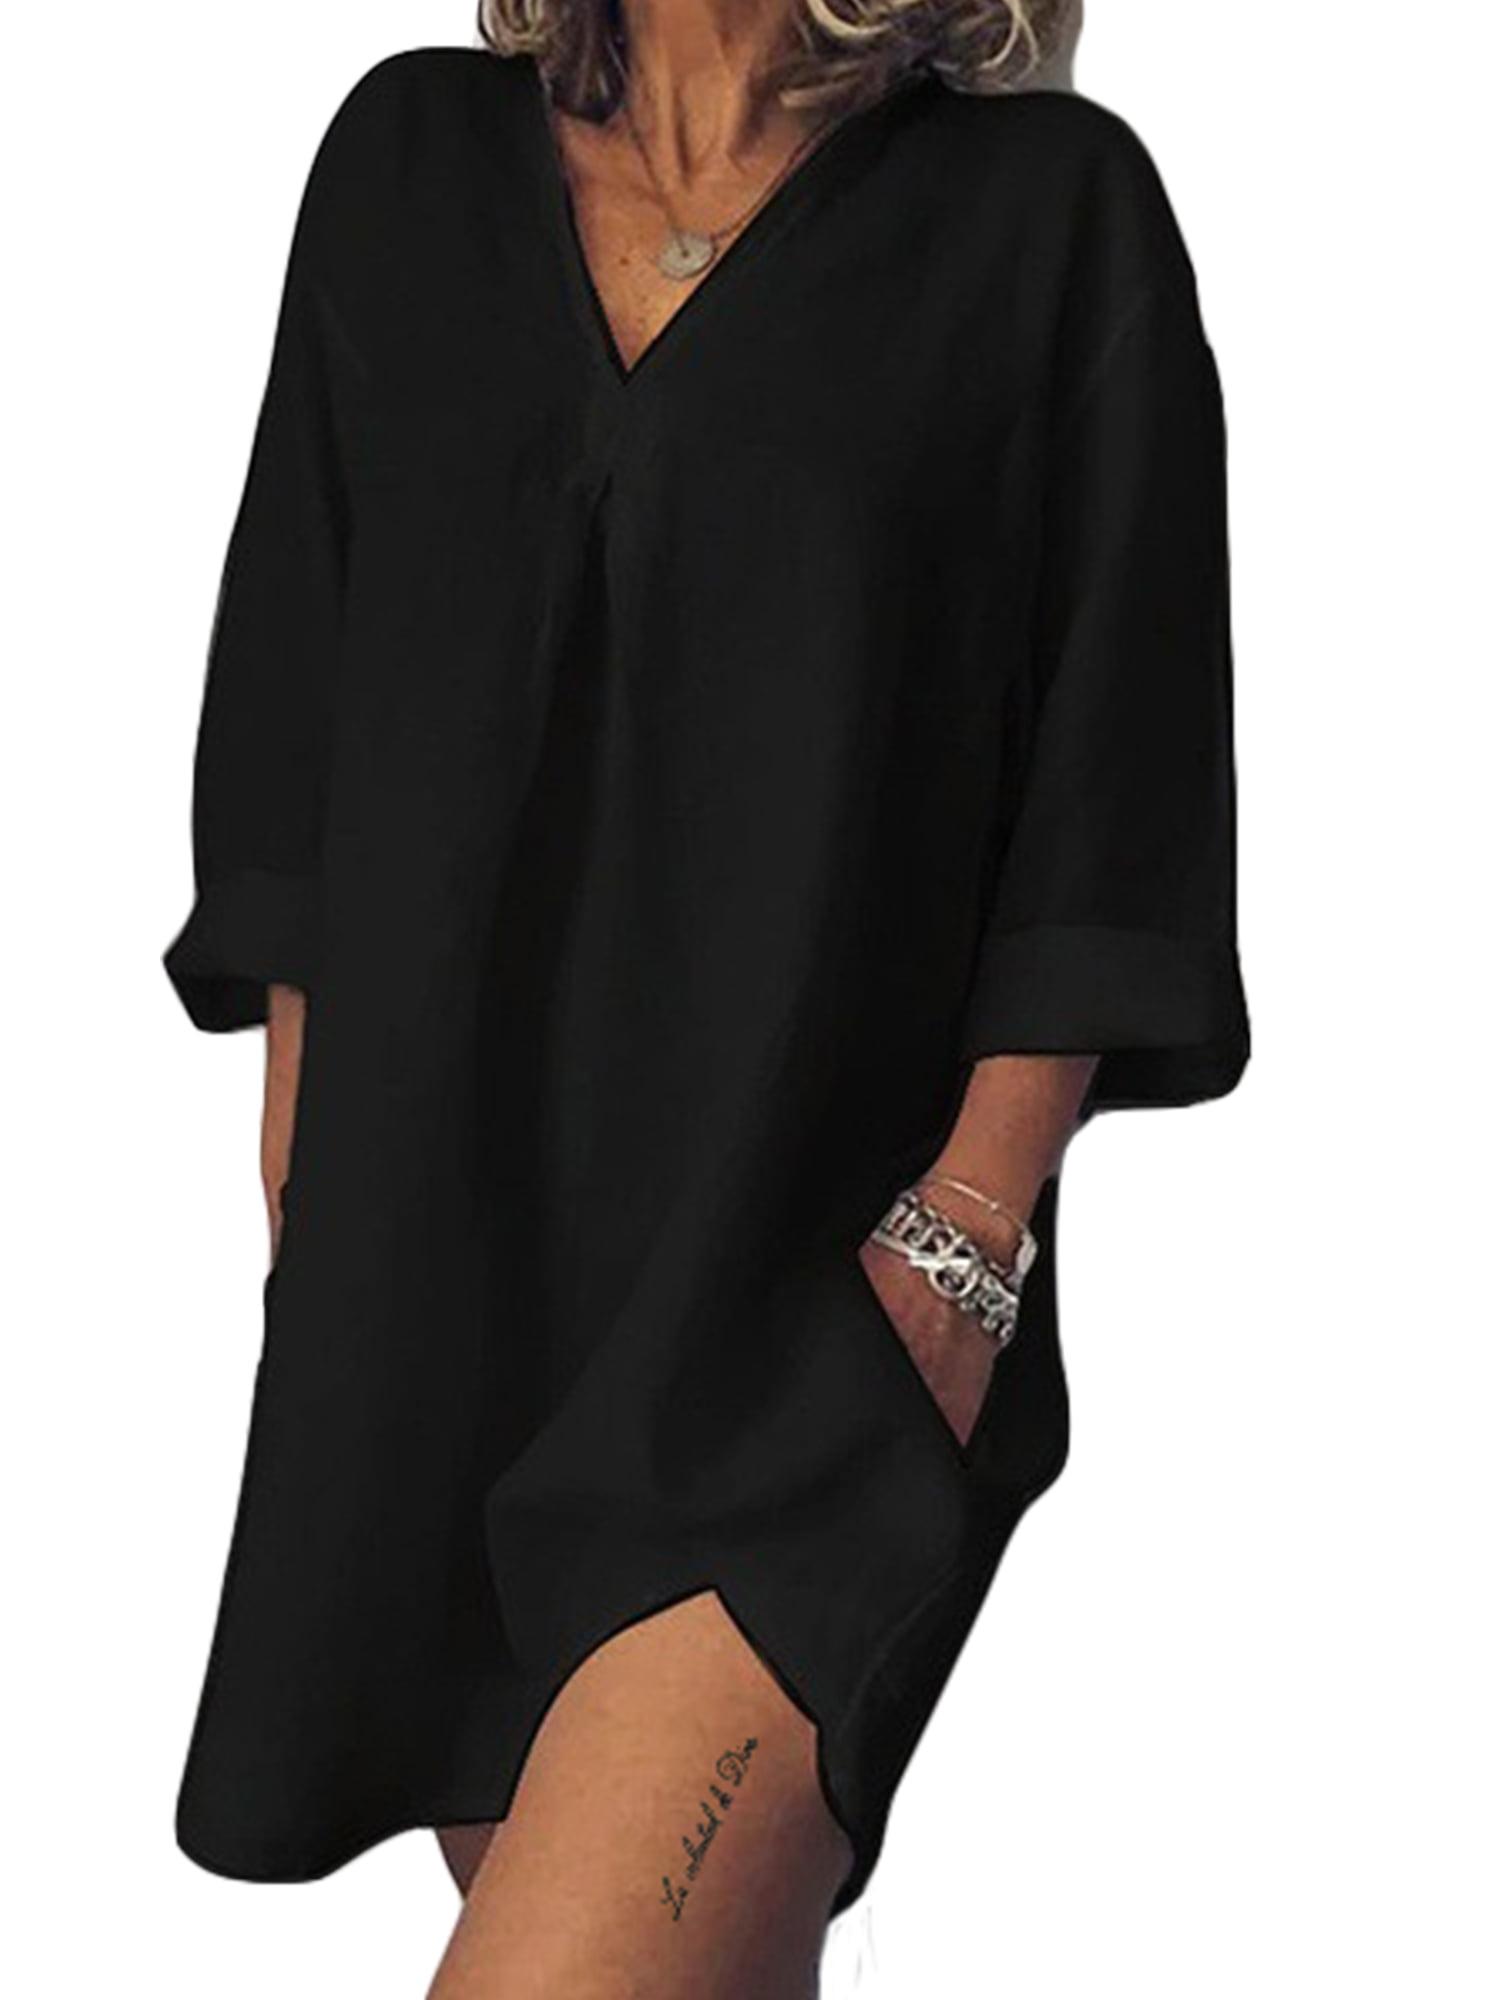 Plus Size Women Short Sleeve Cotton Linen Baggy Blouse Shirt Ladies Summer Tunic Top